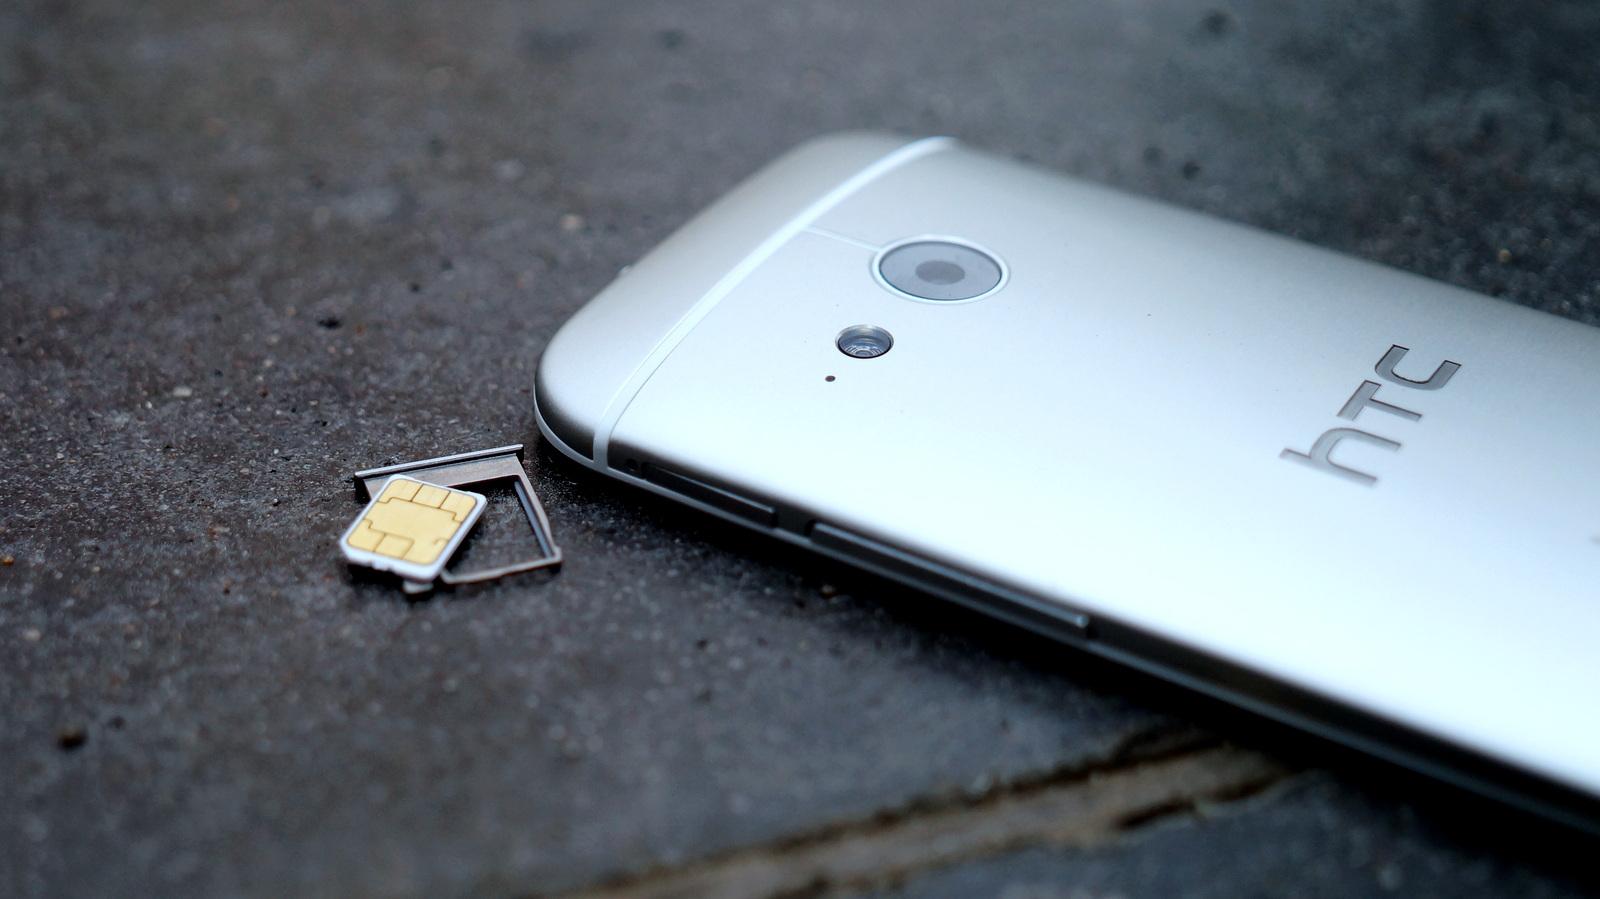 htc one m7 sim karte How to SIM unlock the HTC One mini 2 for free – HTC Source